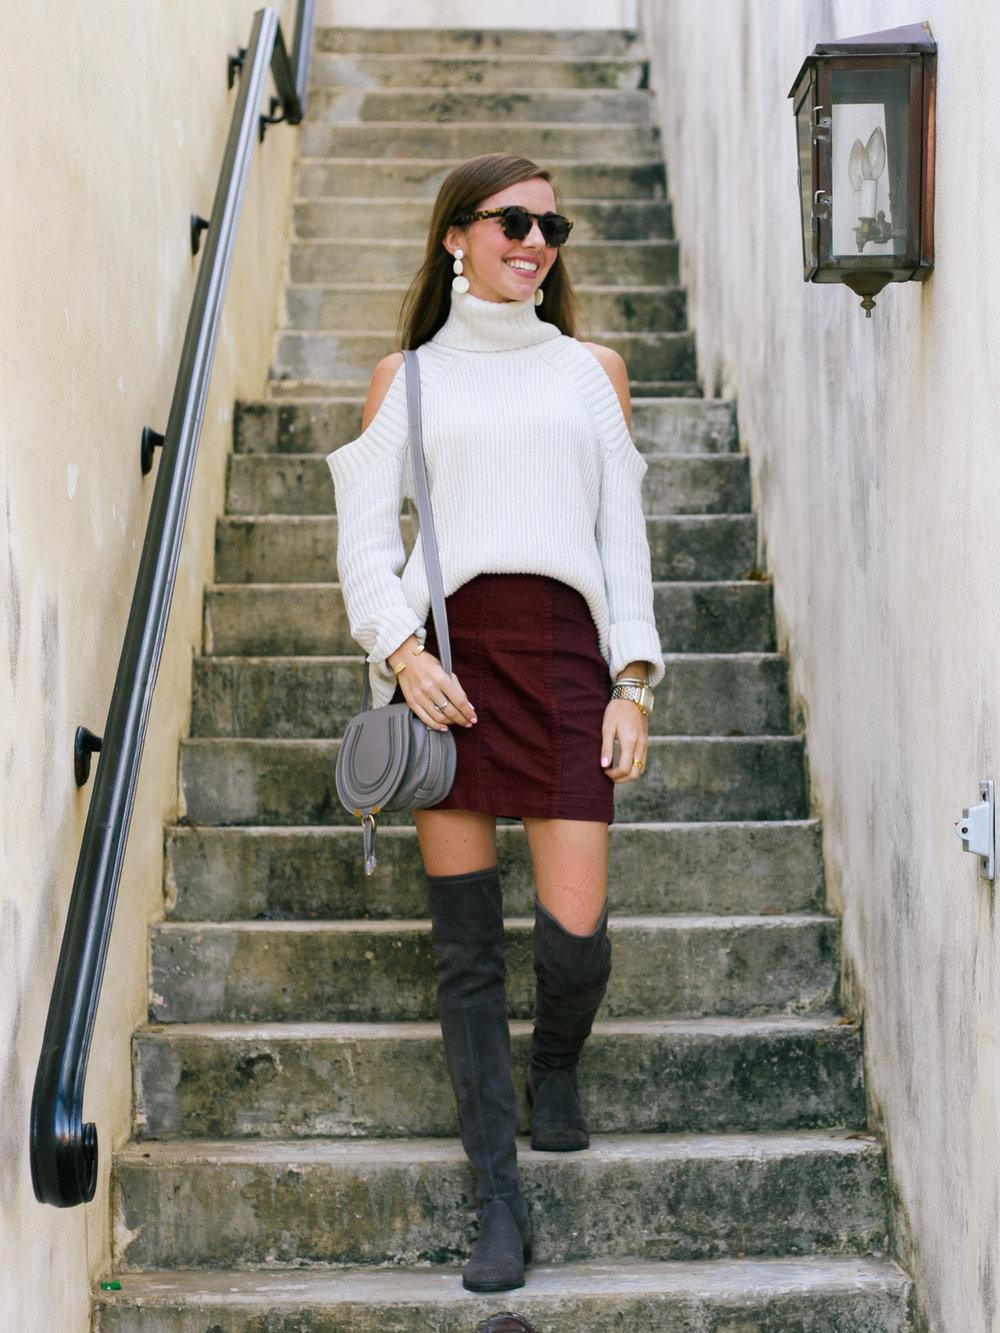 fashion blogger lcb style stuart weitzman suede boots chloe marcie (9 of 13).jpg